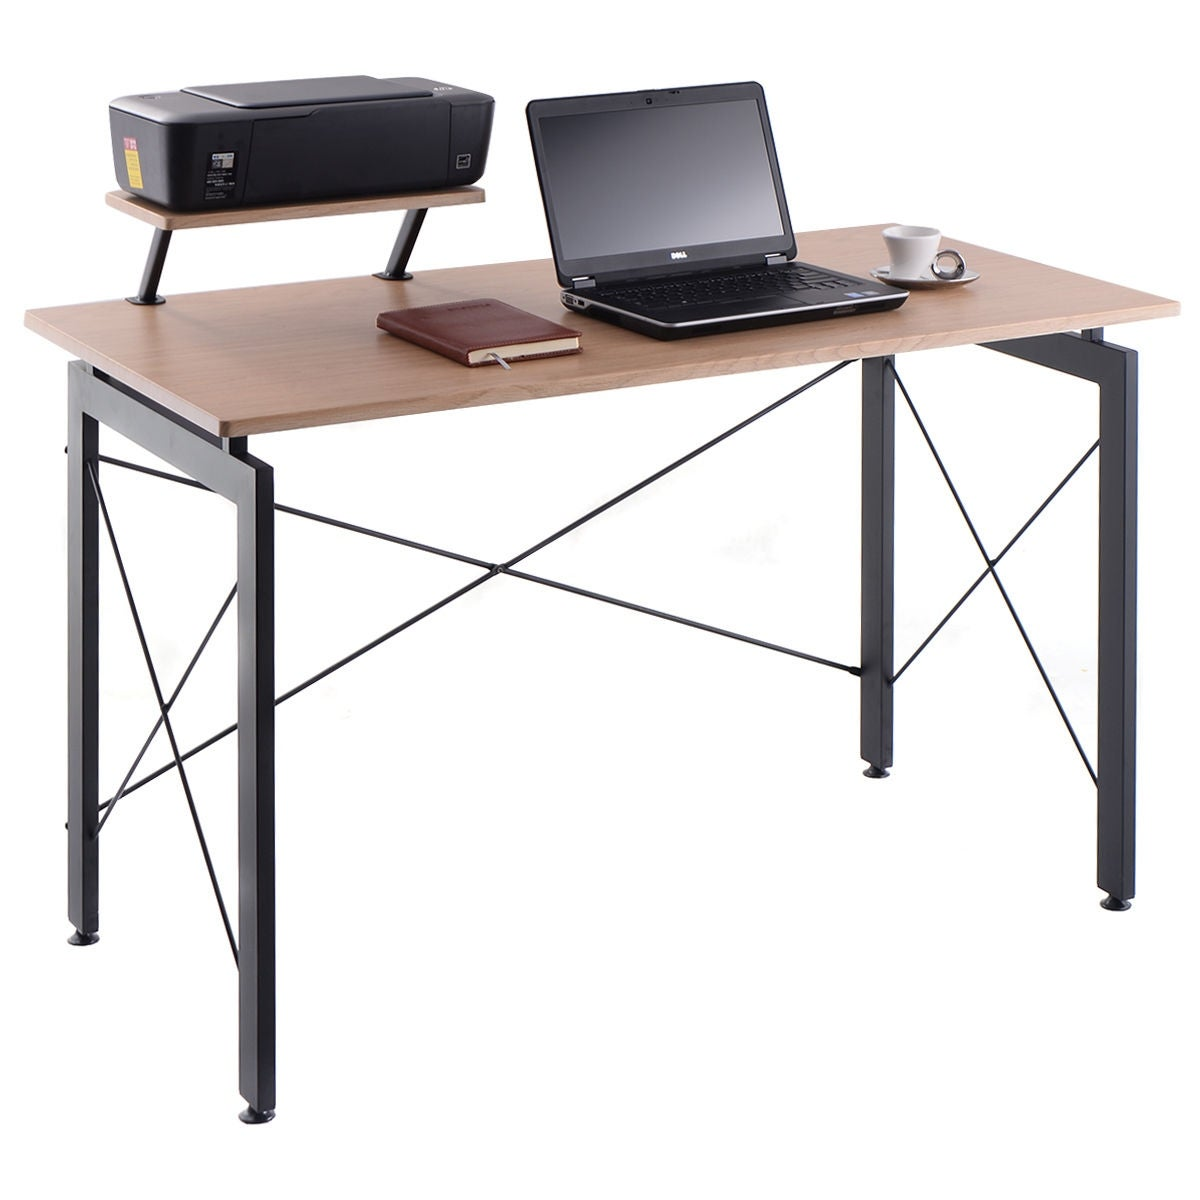 Merveilleux Costway Computer Desk PC Laptop Table W/ Printer Shelf Home Office  Workstation Study   Wood